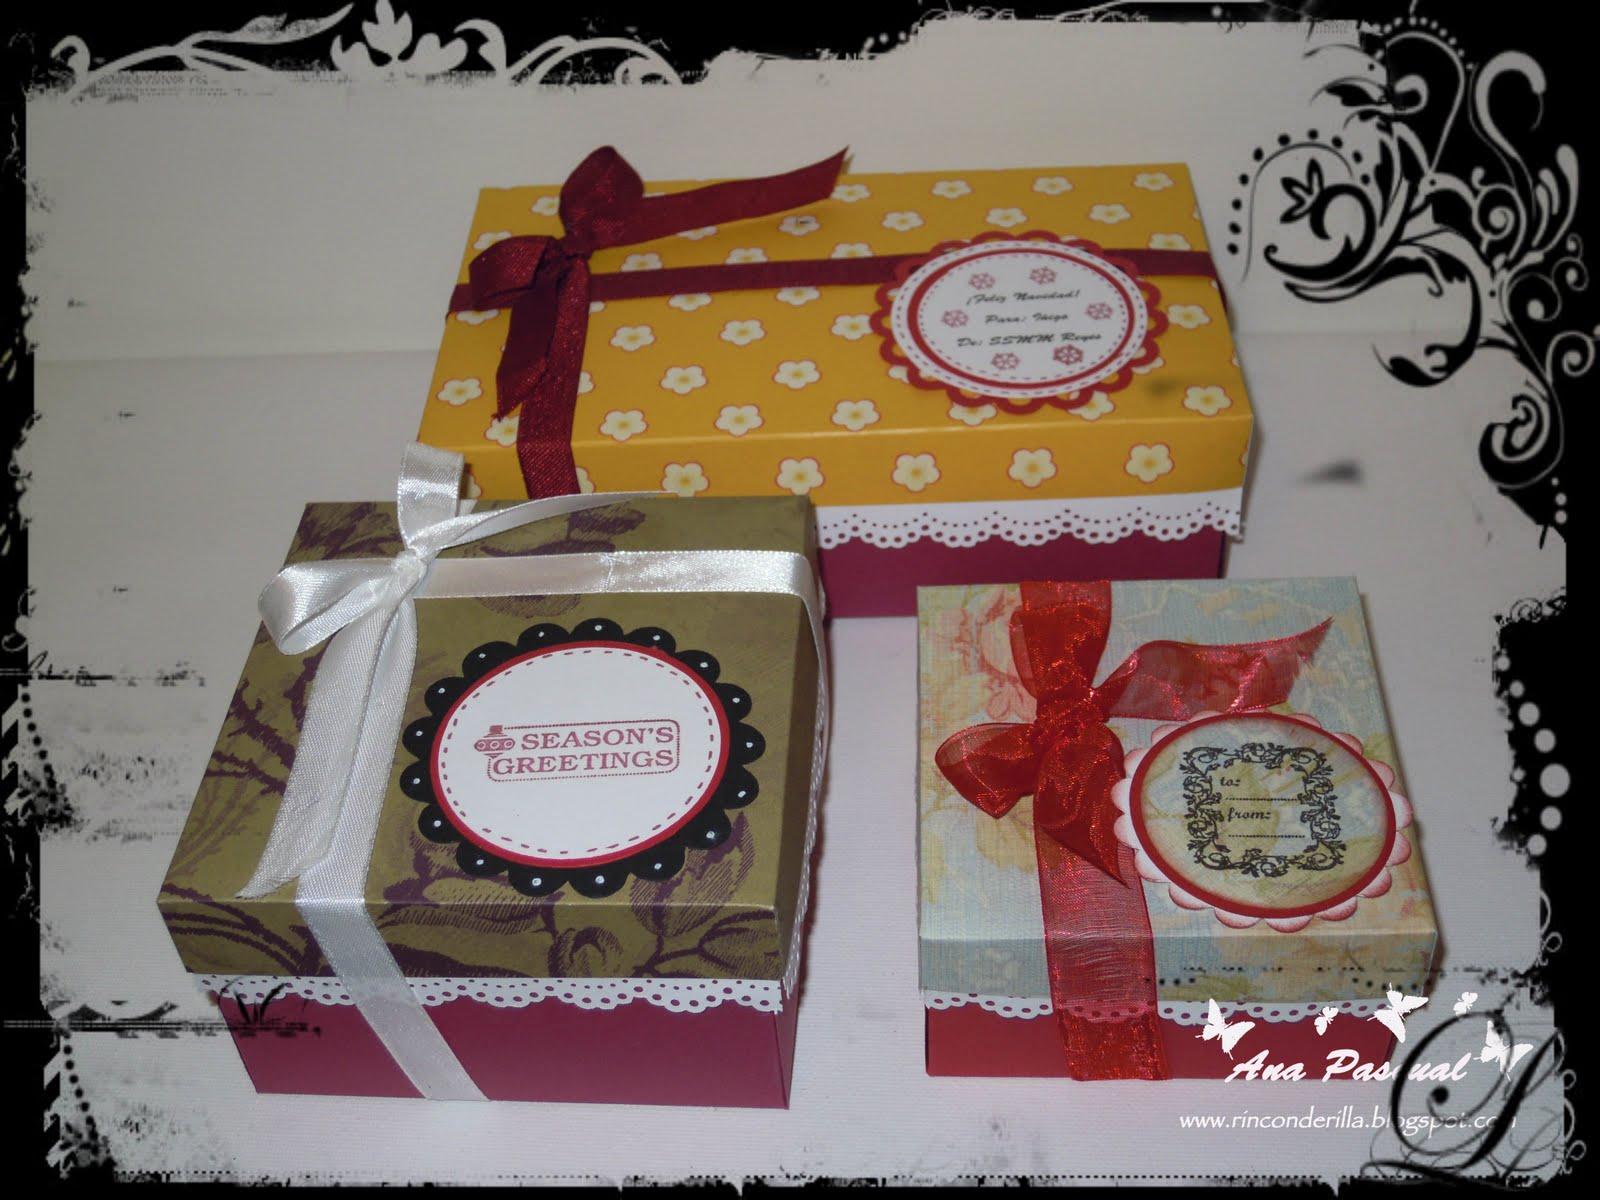 Rincon de rilla envoltorios para regalos a medida - Envoltorios para regalos ...